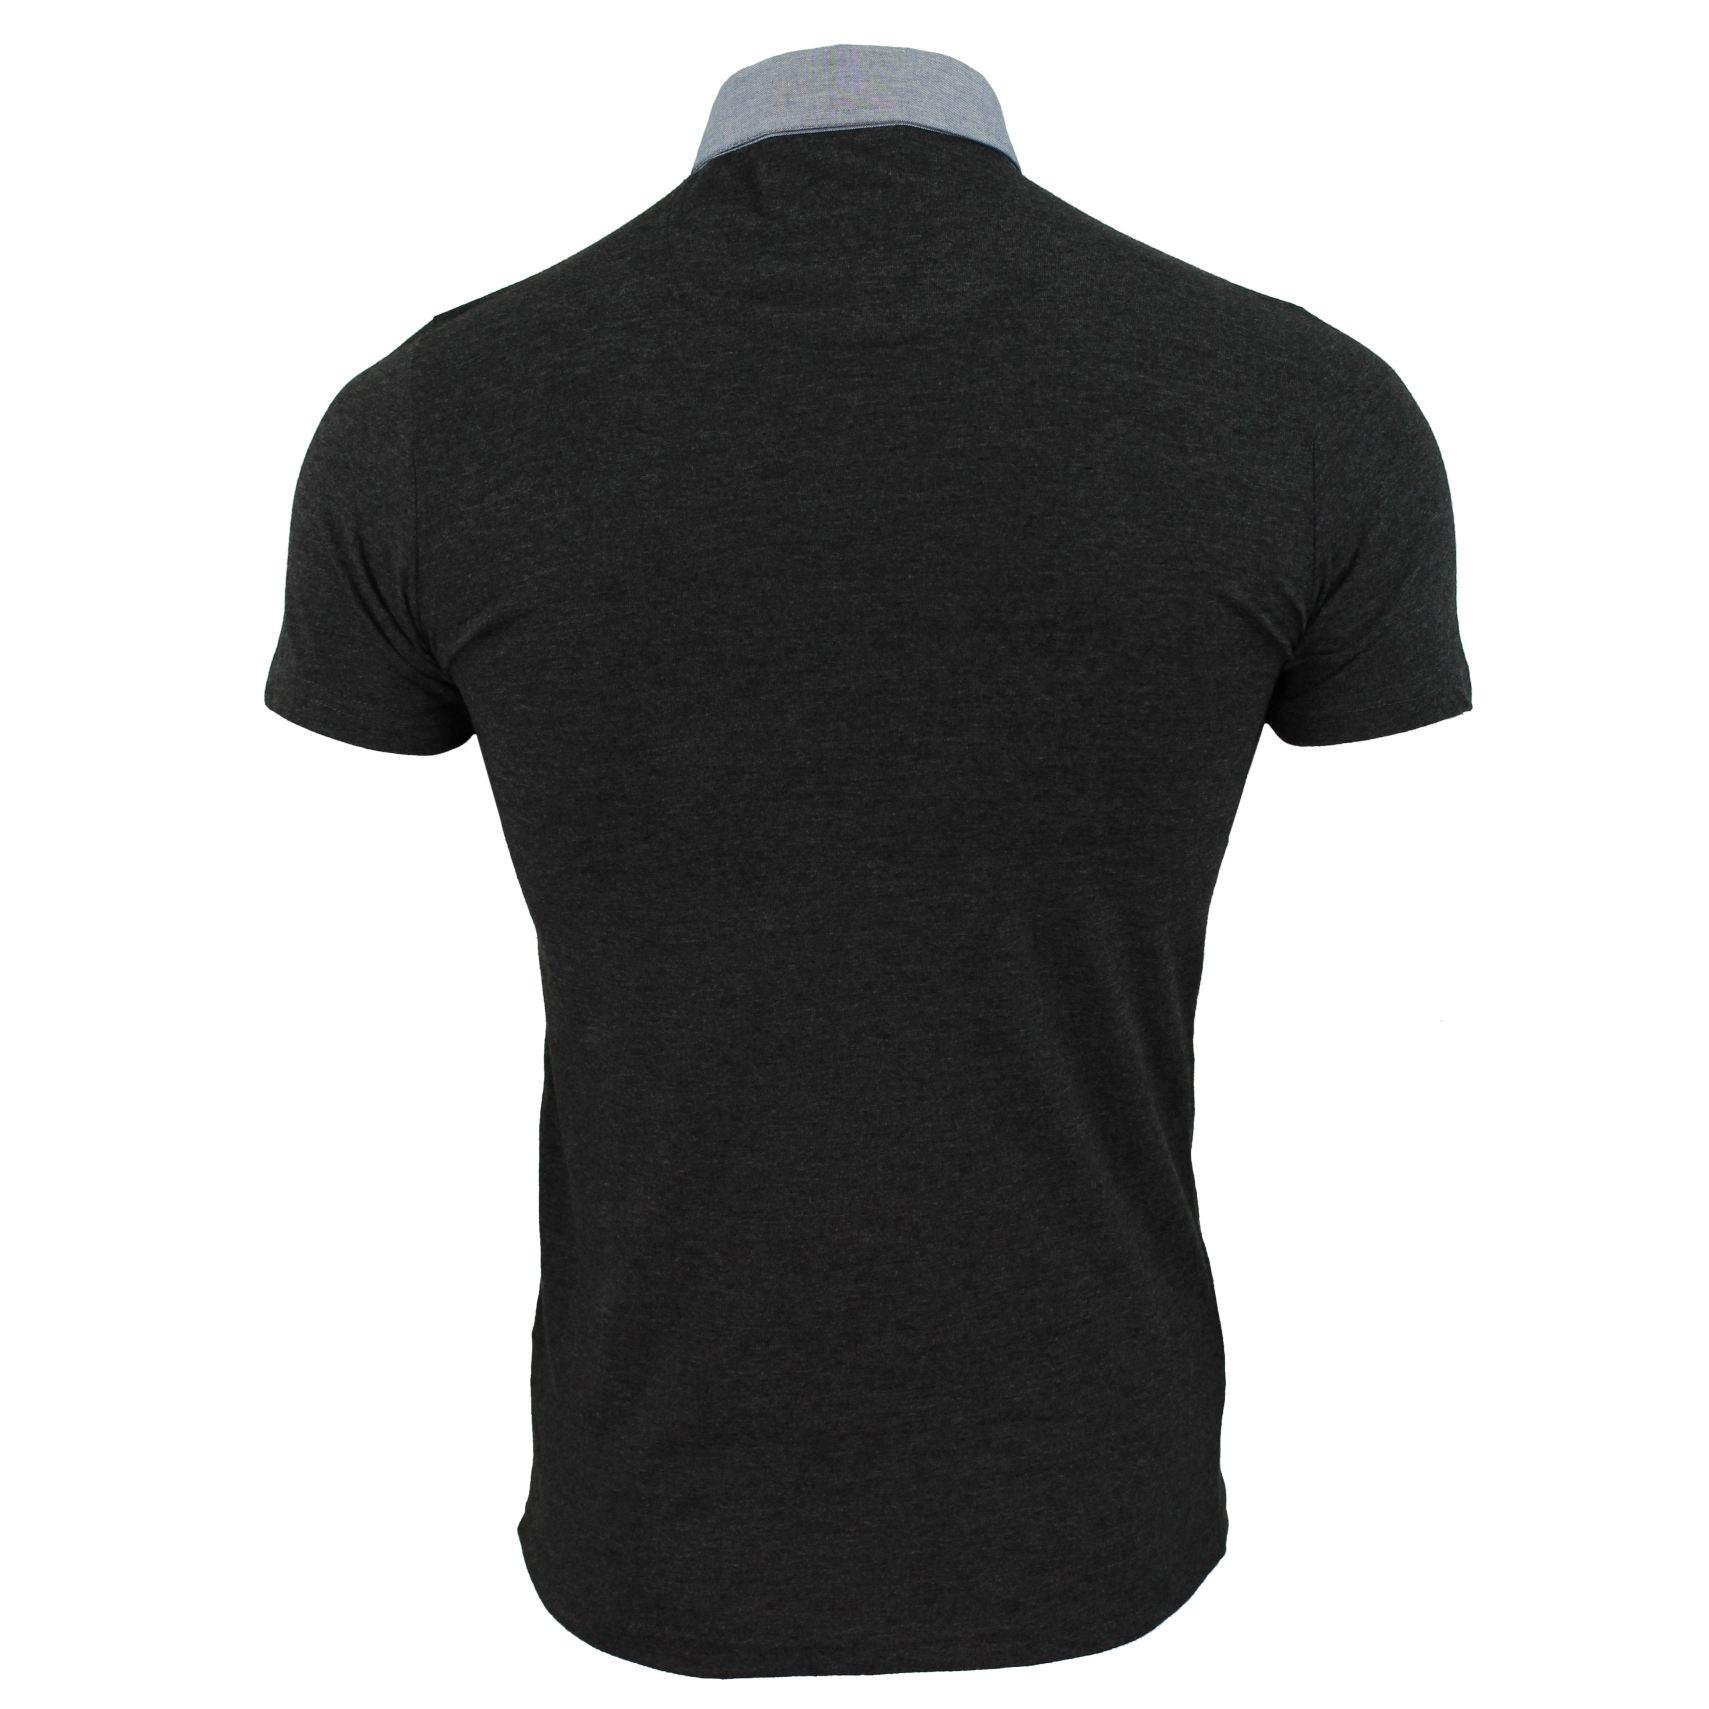 Mens-Polo-T-Shirt-Chimera-Brave-Soul-Denim-Chambray-Collar-Short-Sleeved-Cotton thumbnail 12